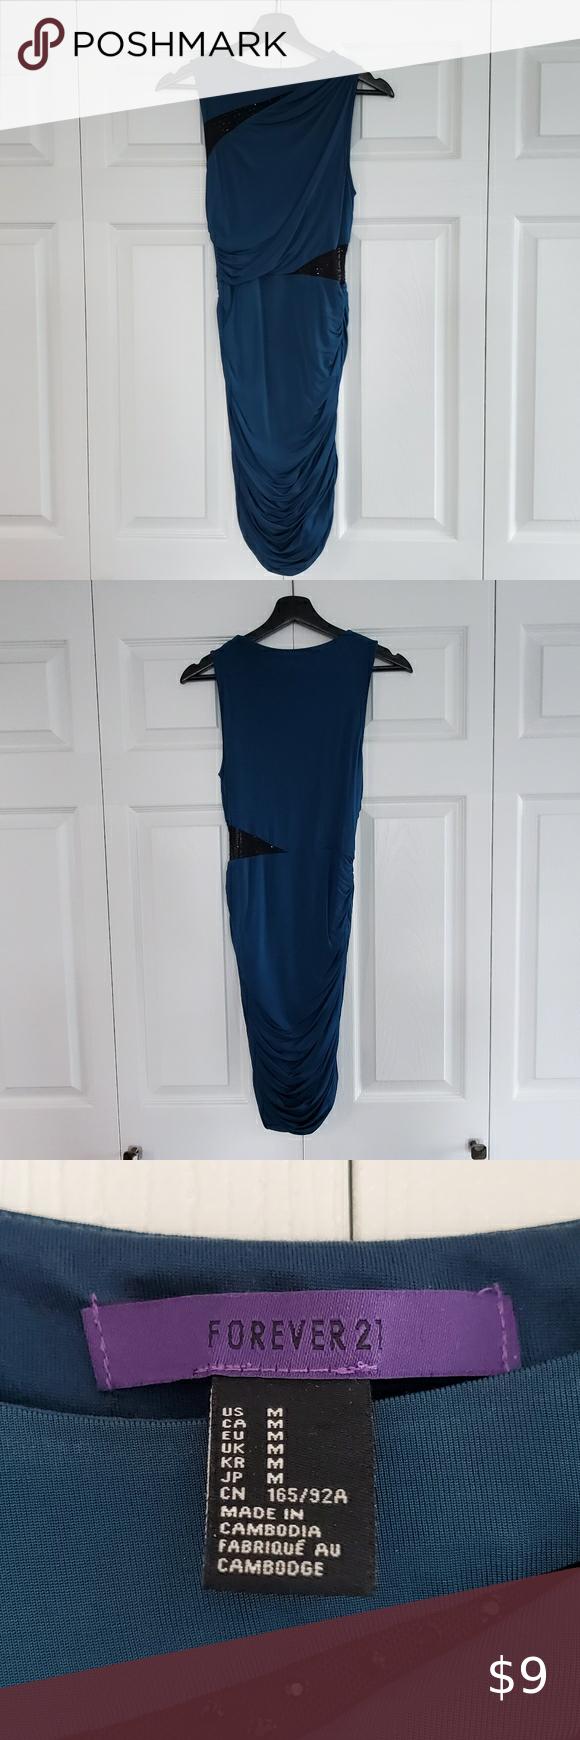 Ruched Bodycon Dress Ruched Bodycon Dress Stretchy Bodycon Dress Bodycon Dress [ 1740 x 580 Pixel ]